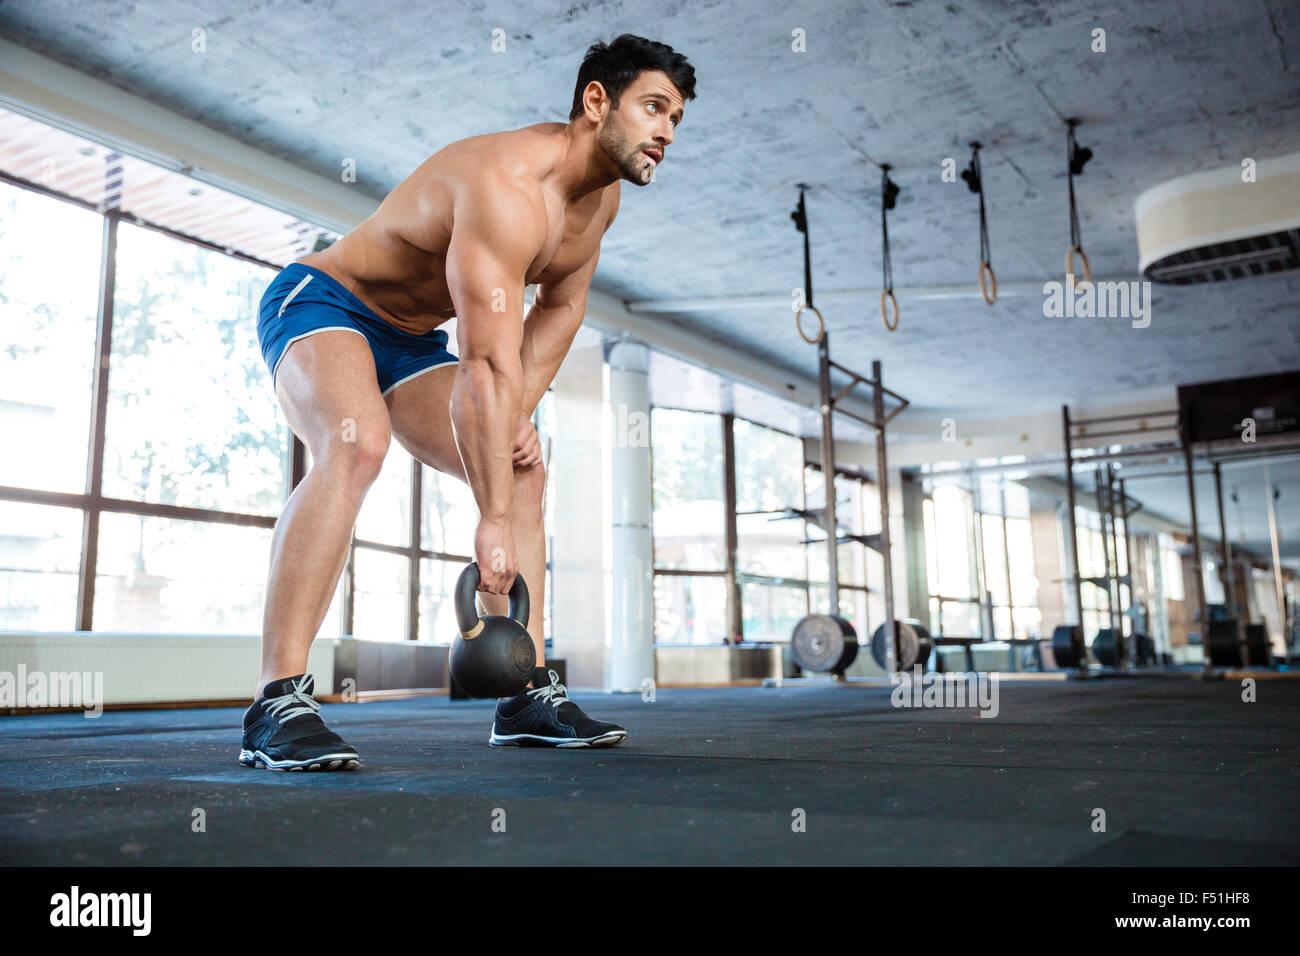 Beautiful athlet wearing blue shorts lifting kettle ball - Stock Image